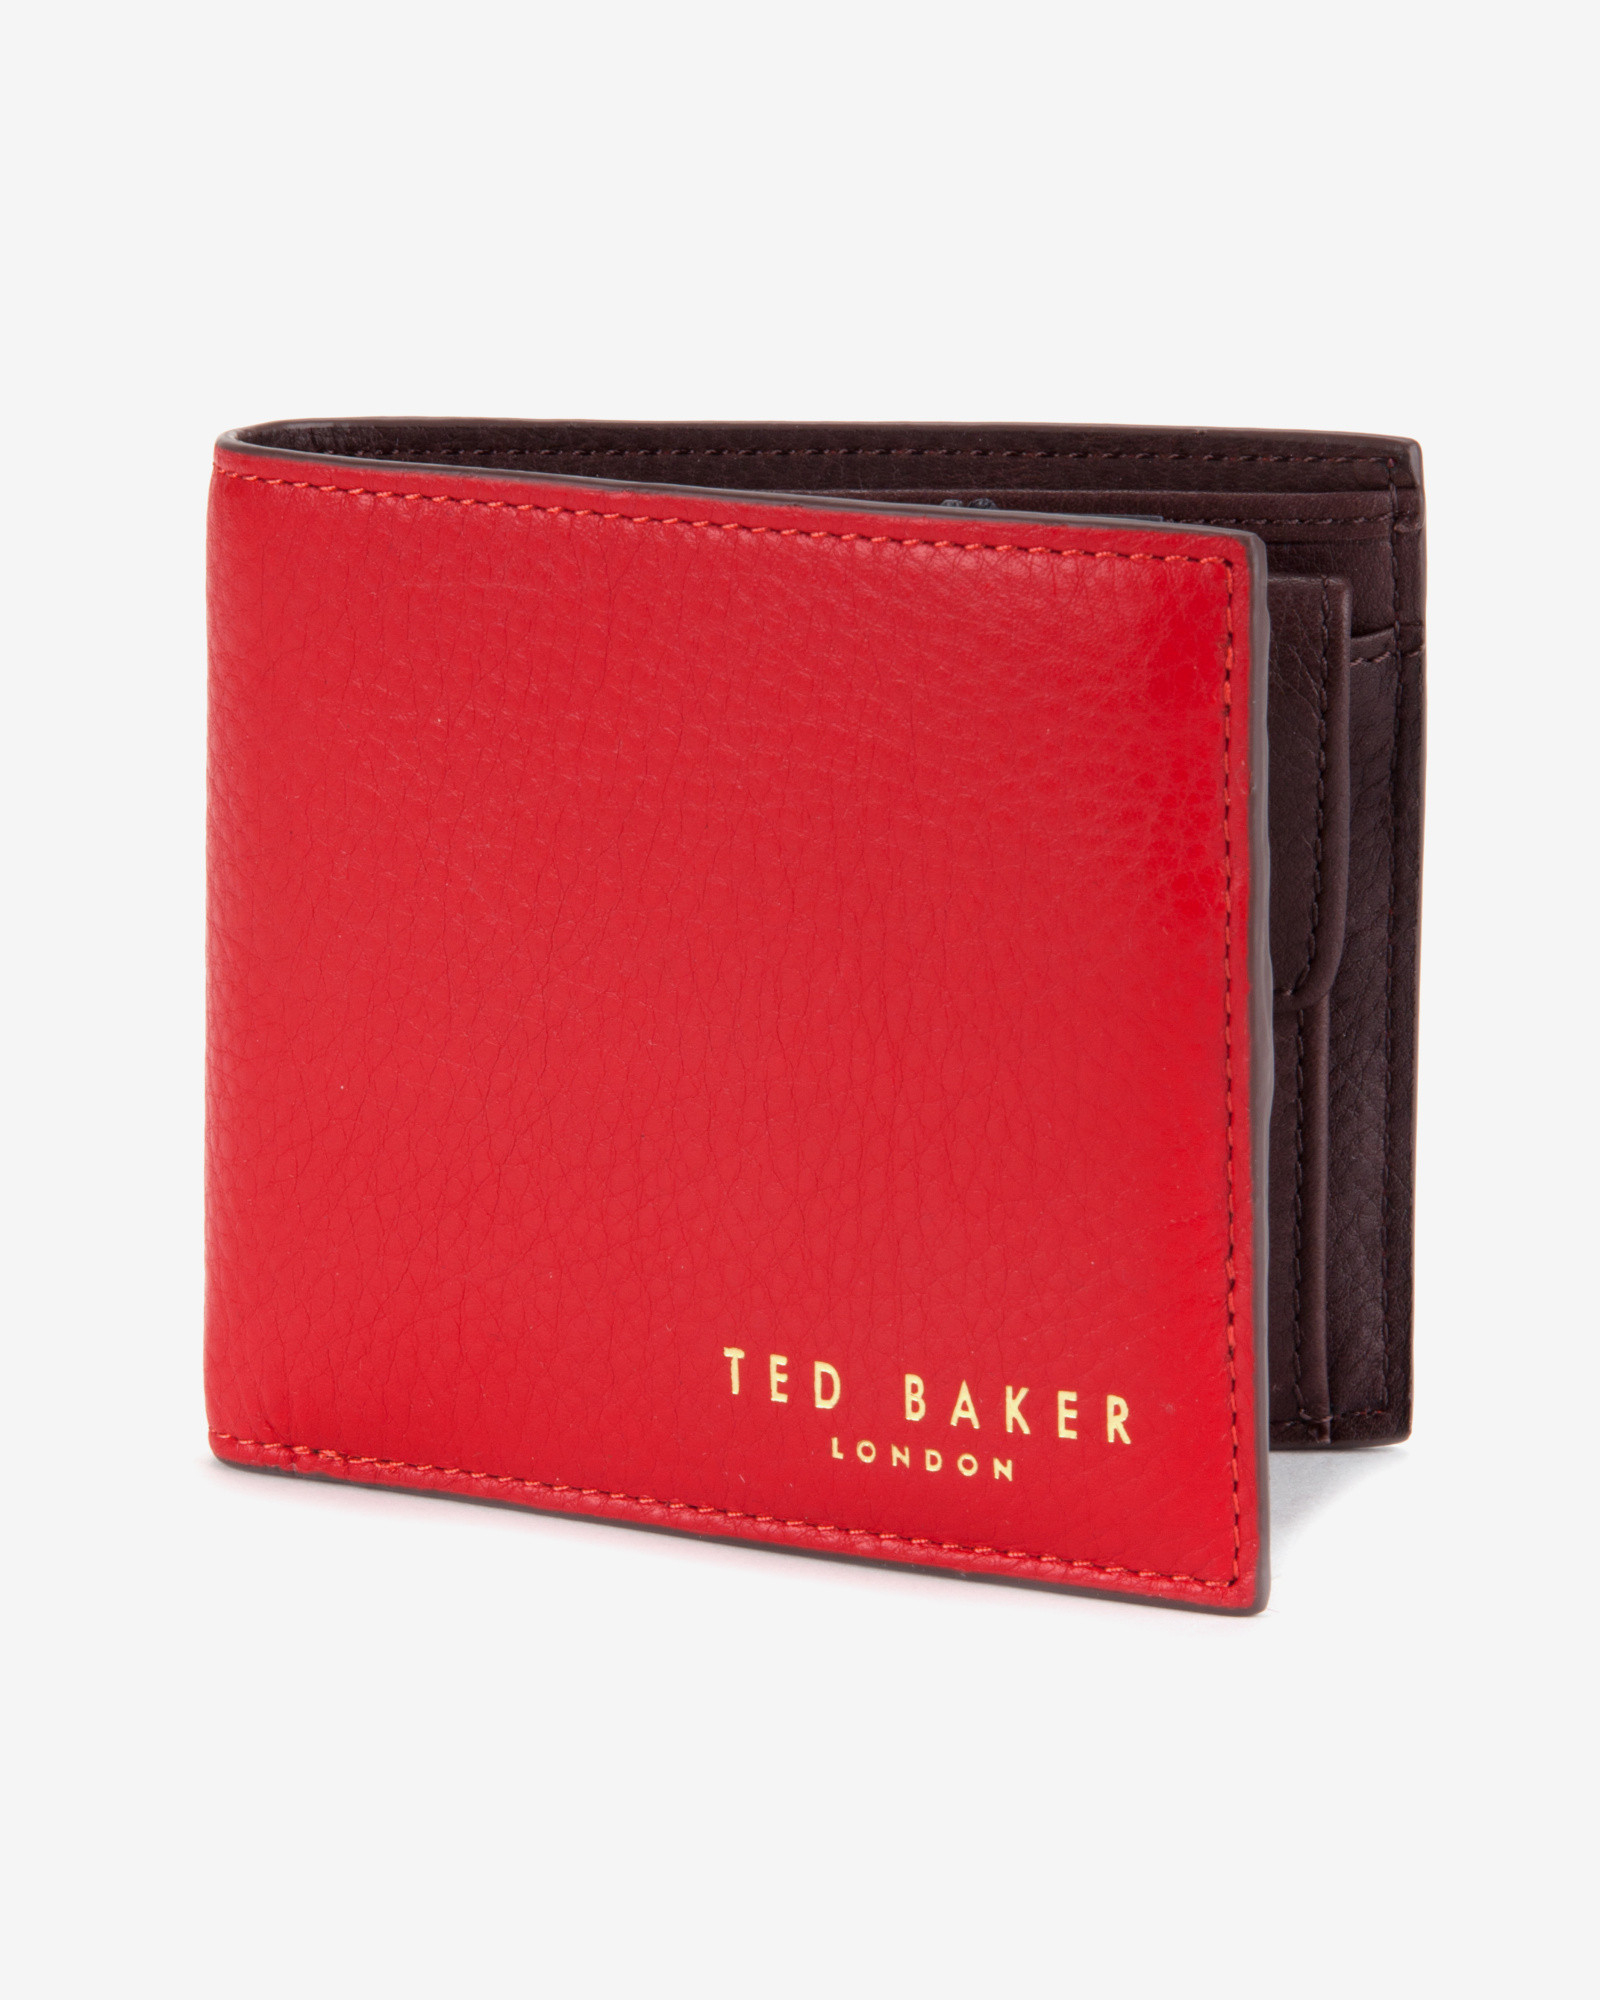 e262bb2e2 Ted Baker Men S Wallets Canada - Best Photo Wallet Justiceforkenny.Org